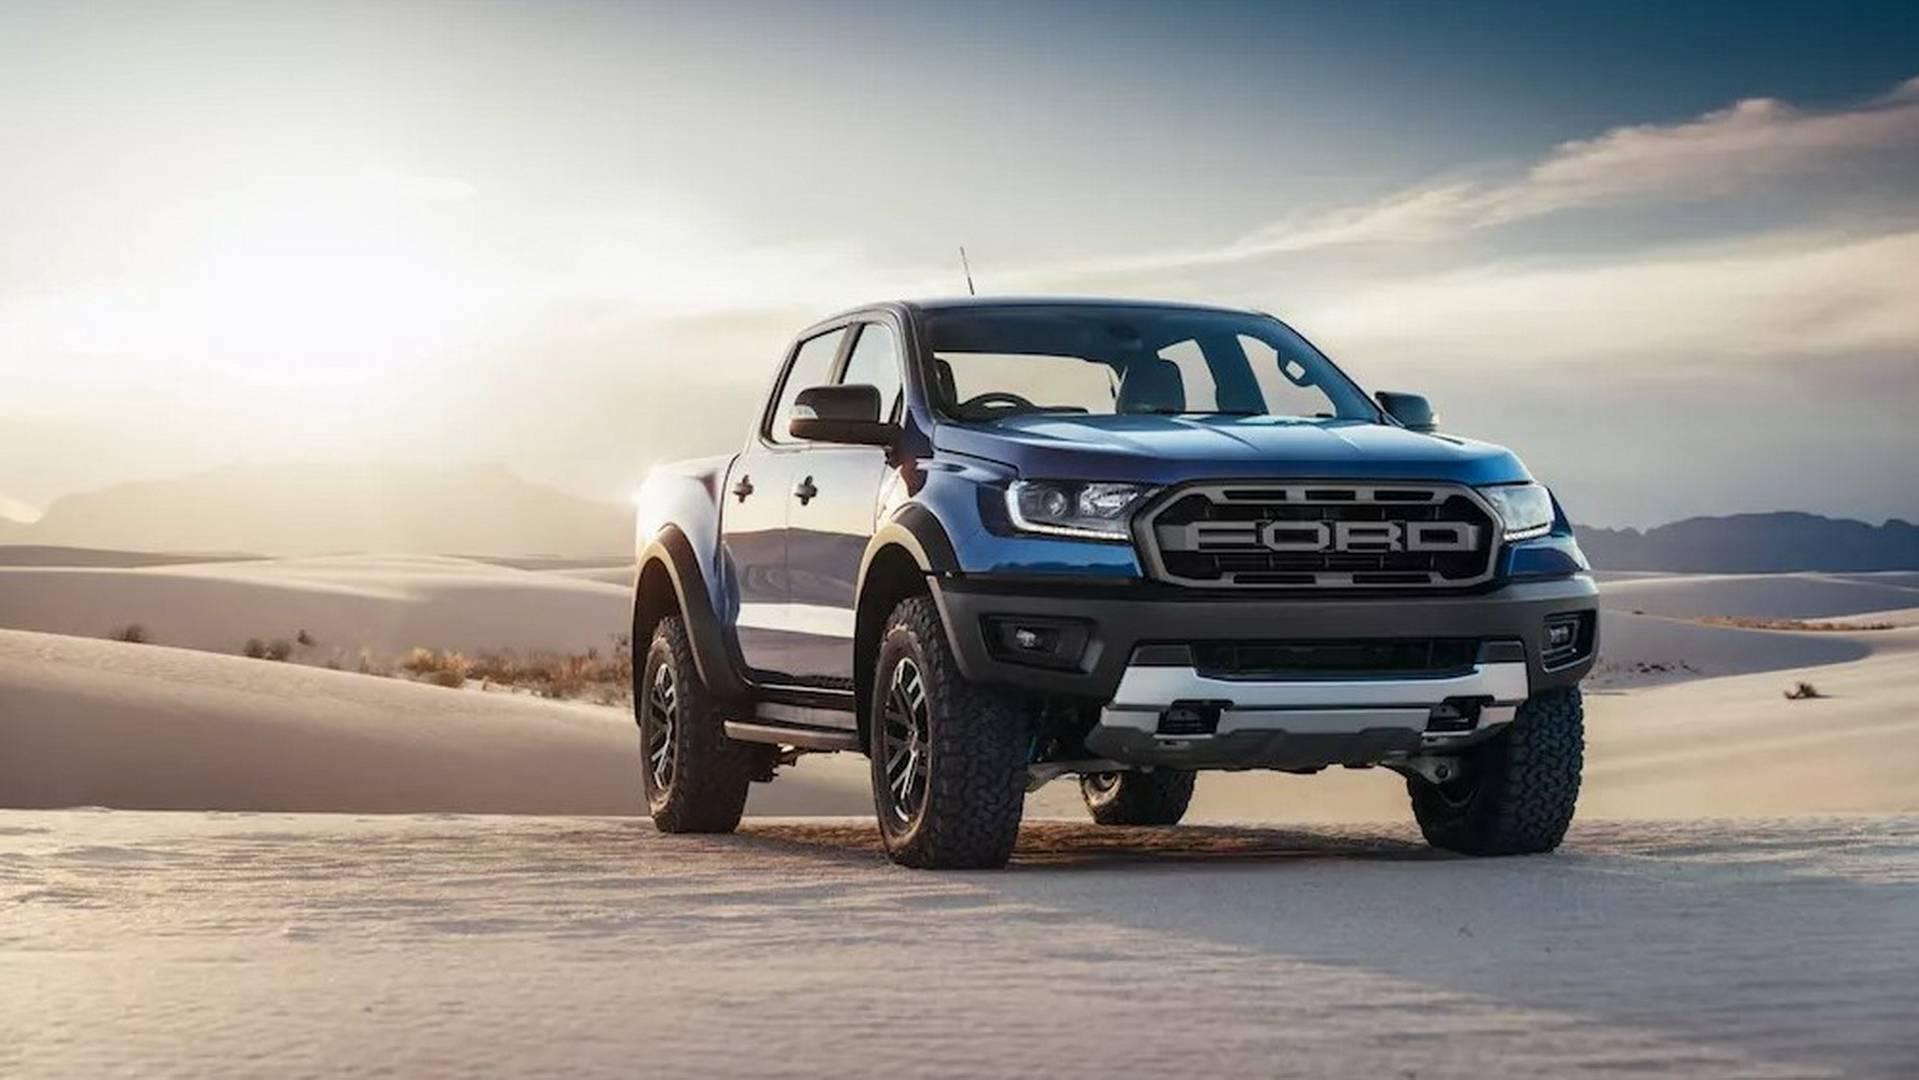 Chief Engineer Defends The Diesel Engine Of The Ford Ranger Raptor on Ford Ranger 3 0 V6 Engine